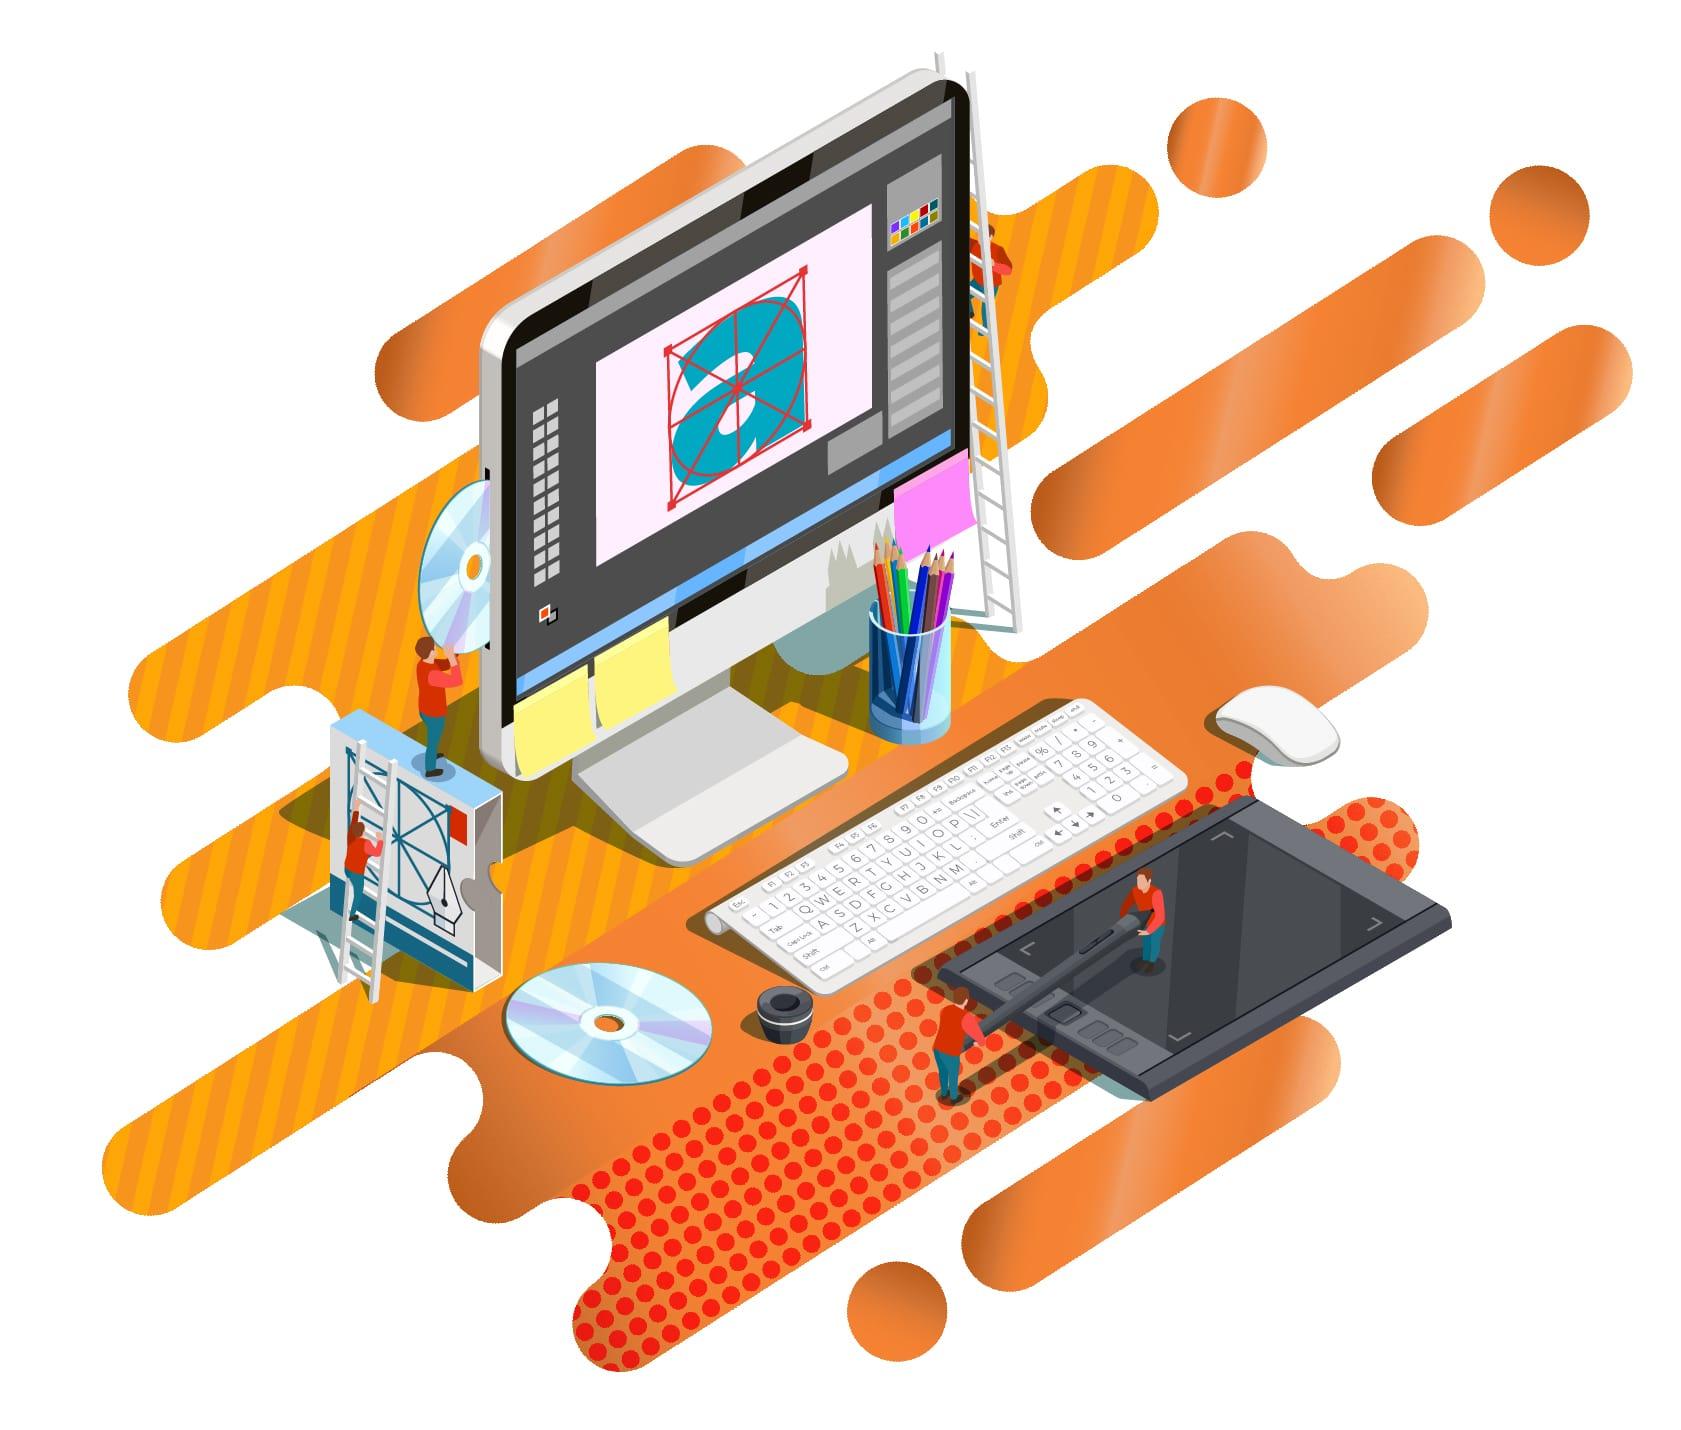 DKAmedia Agencja Reklamowa - oferta grafika